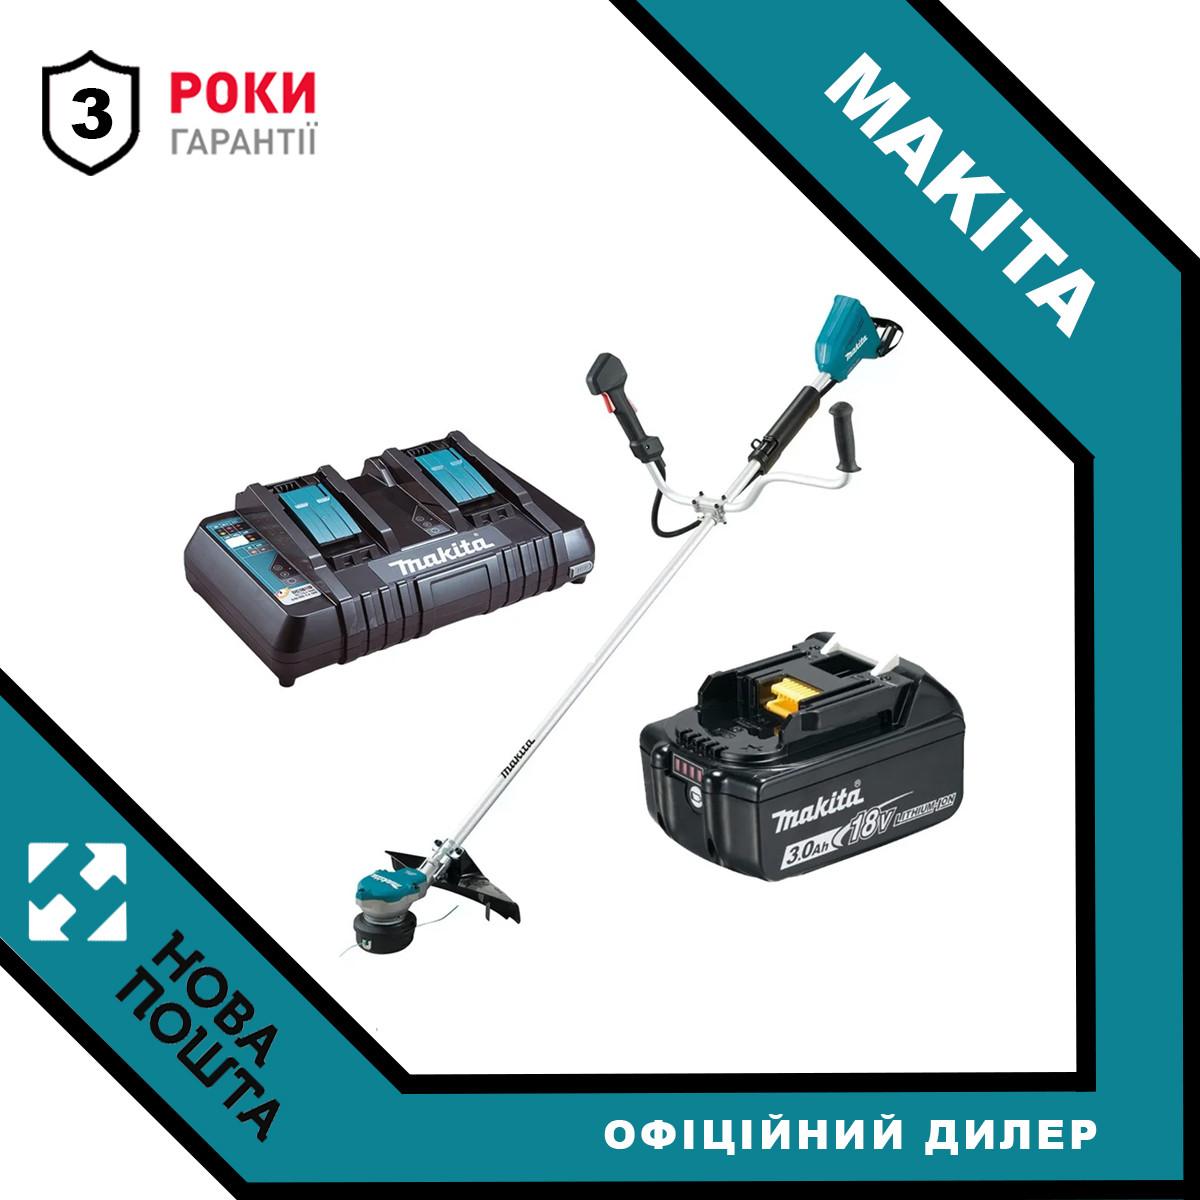 Аккумуляторный триммер MAKITA DUR368AZ + Быстрозарядное устройство и Аккумулятор 18В LXT 3 Аг